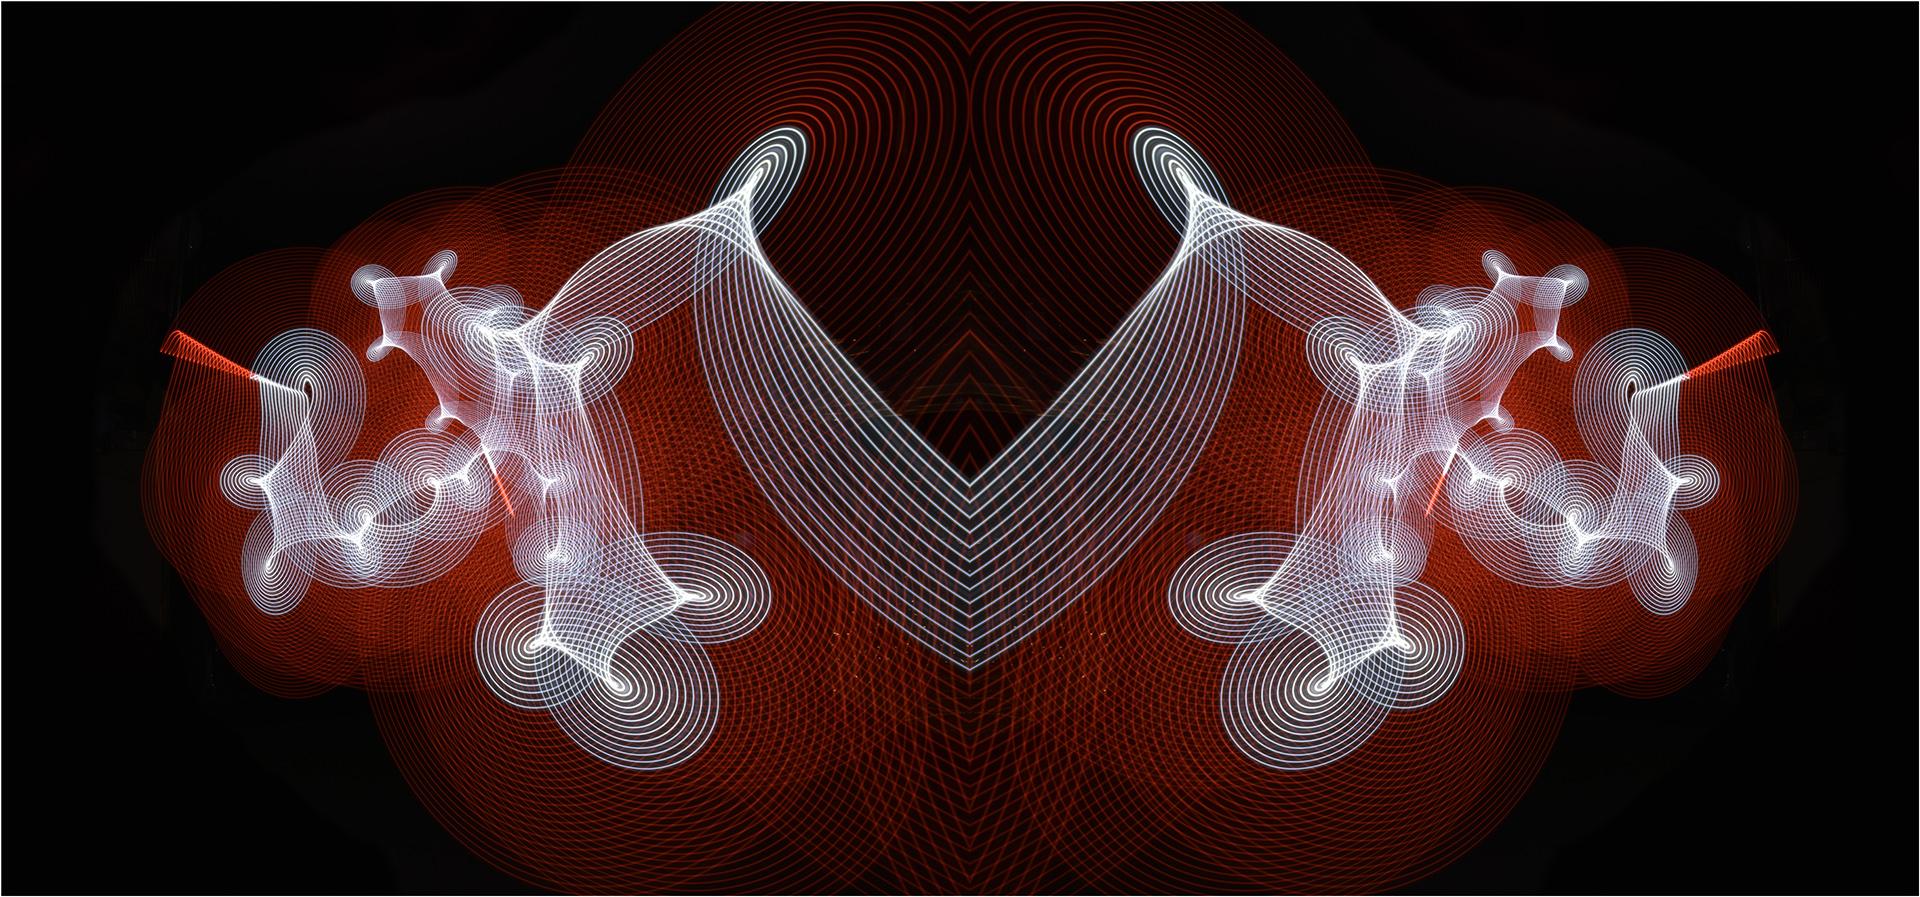 Patterns I